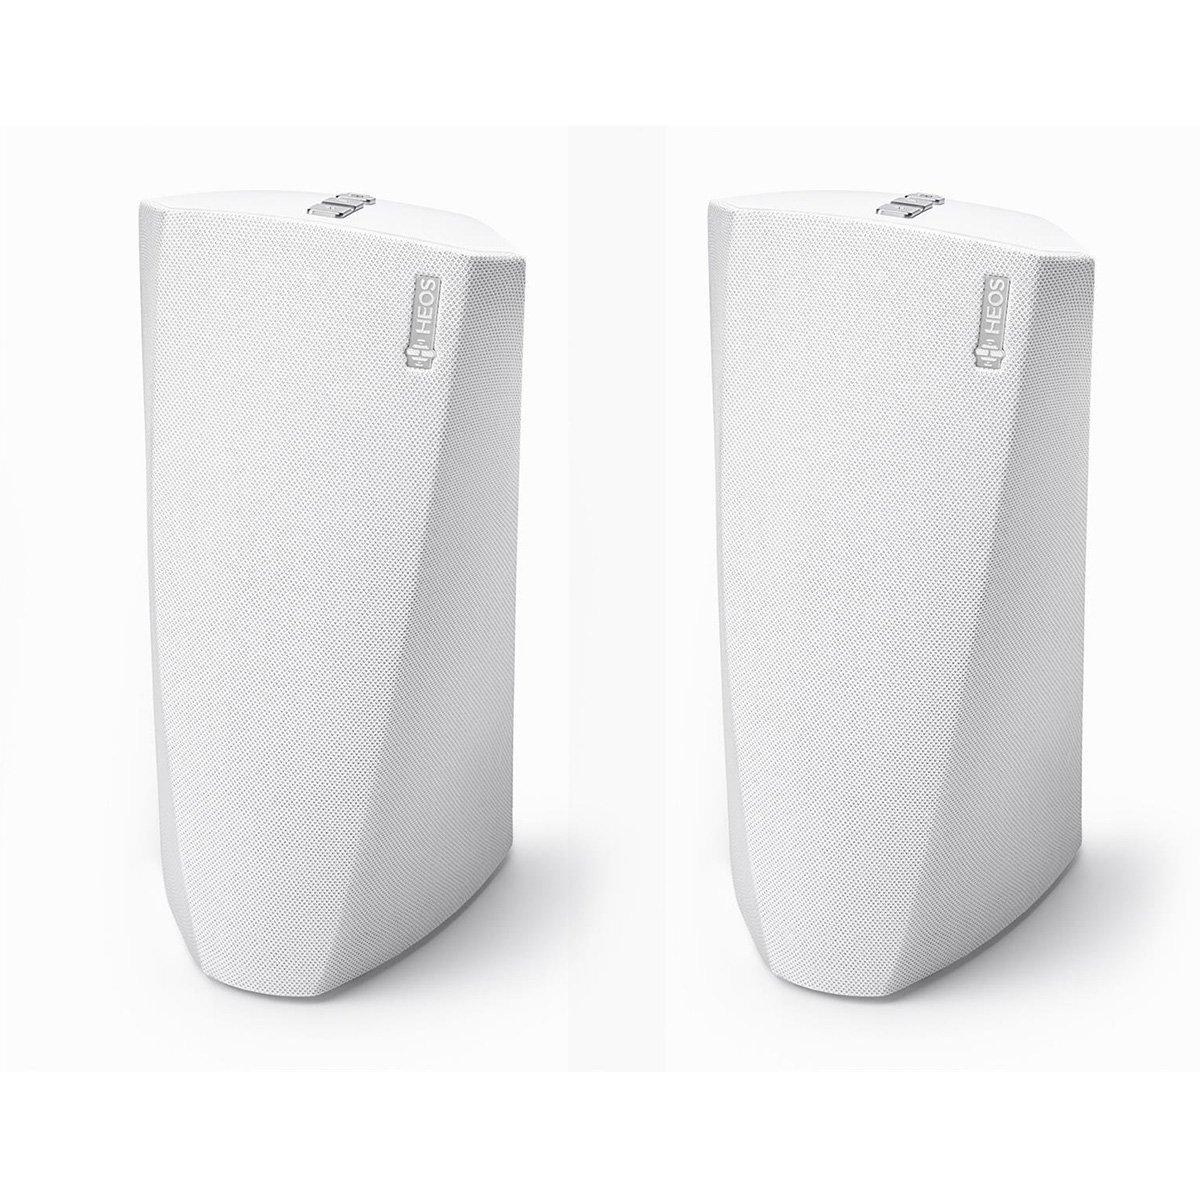 Denon HEOS 3 Dual-Driver Wireless Speaker System - Series 2 Pair (White)